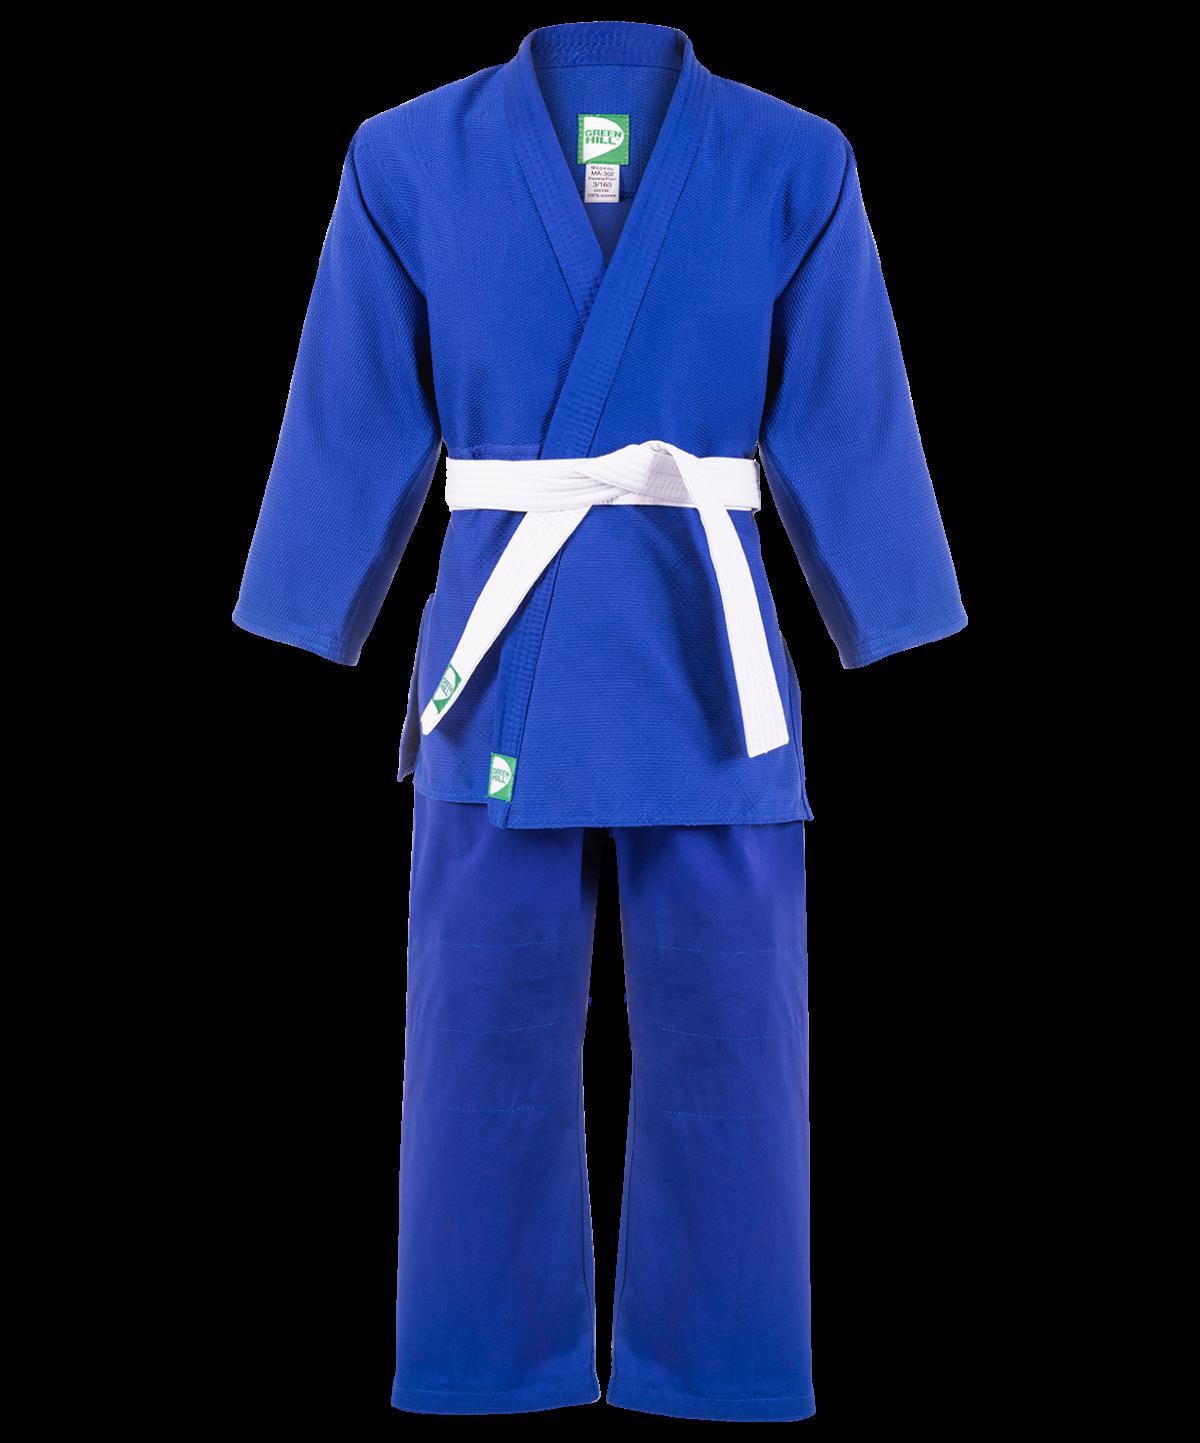 GREEN HILL Кимоно дзюдо 2/150  MA-302: синий - 1